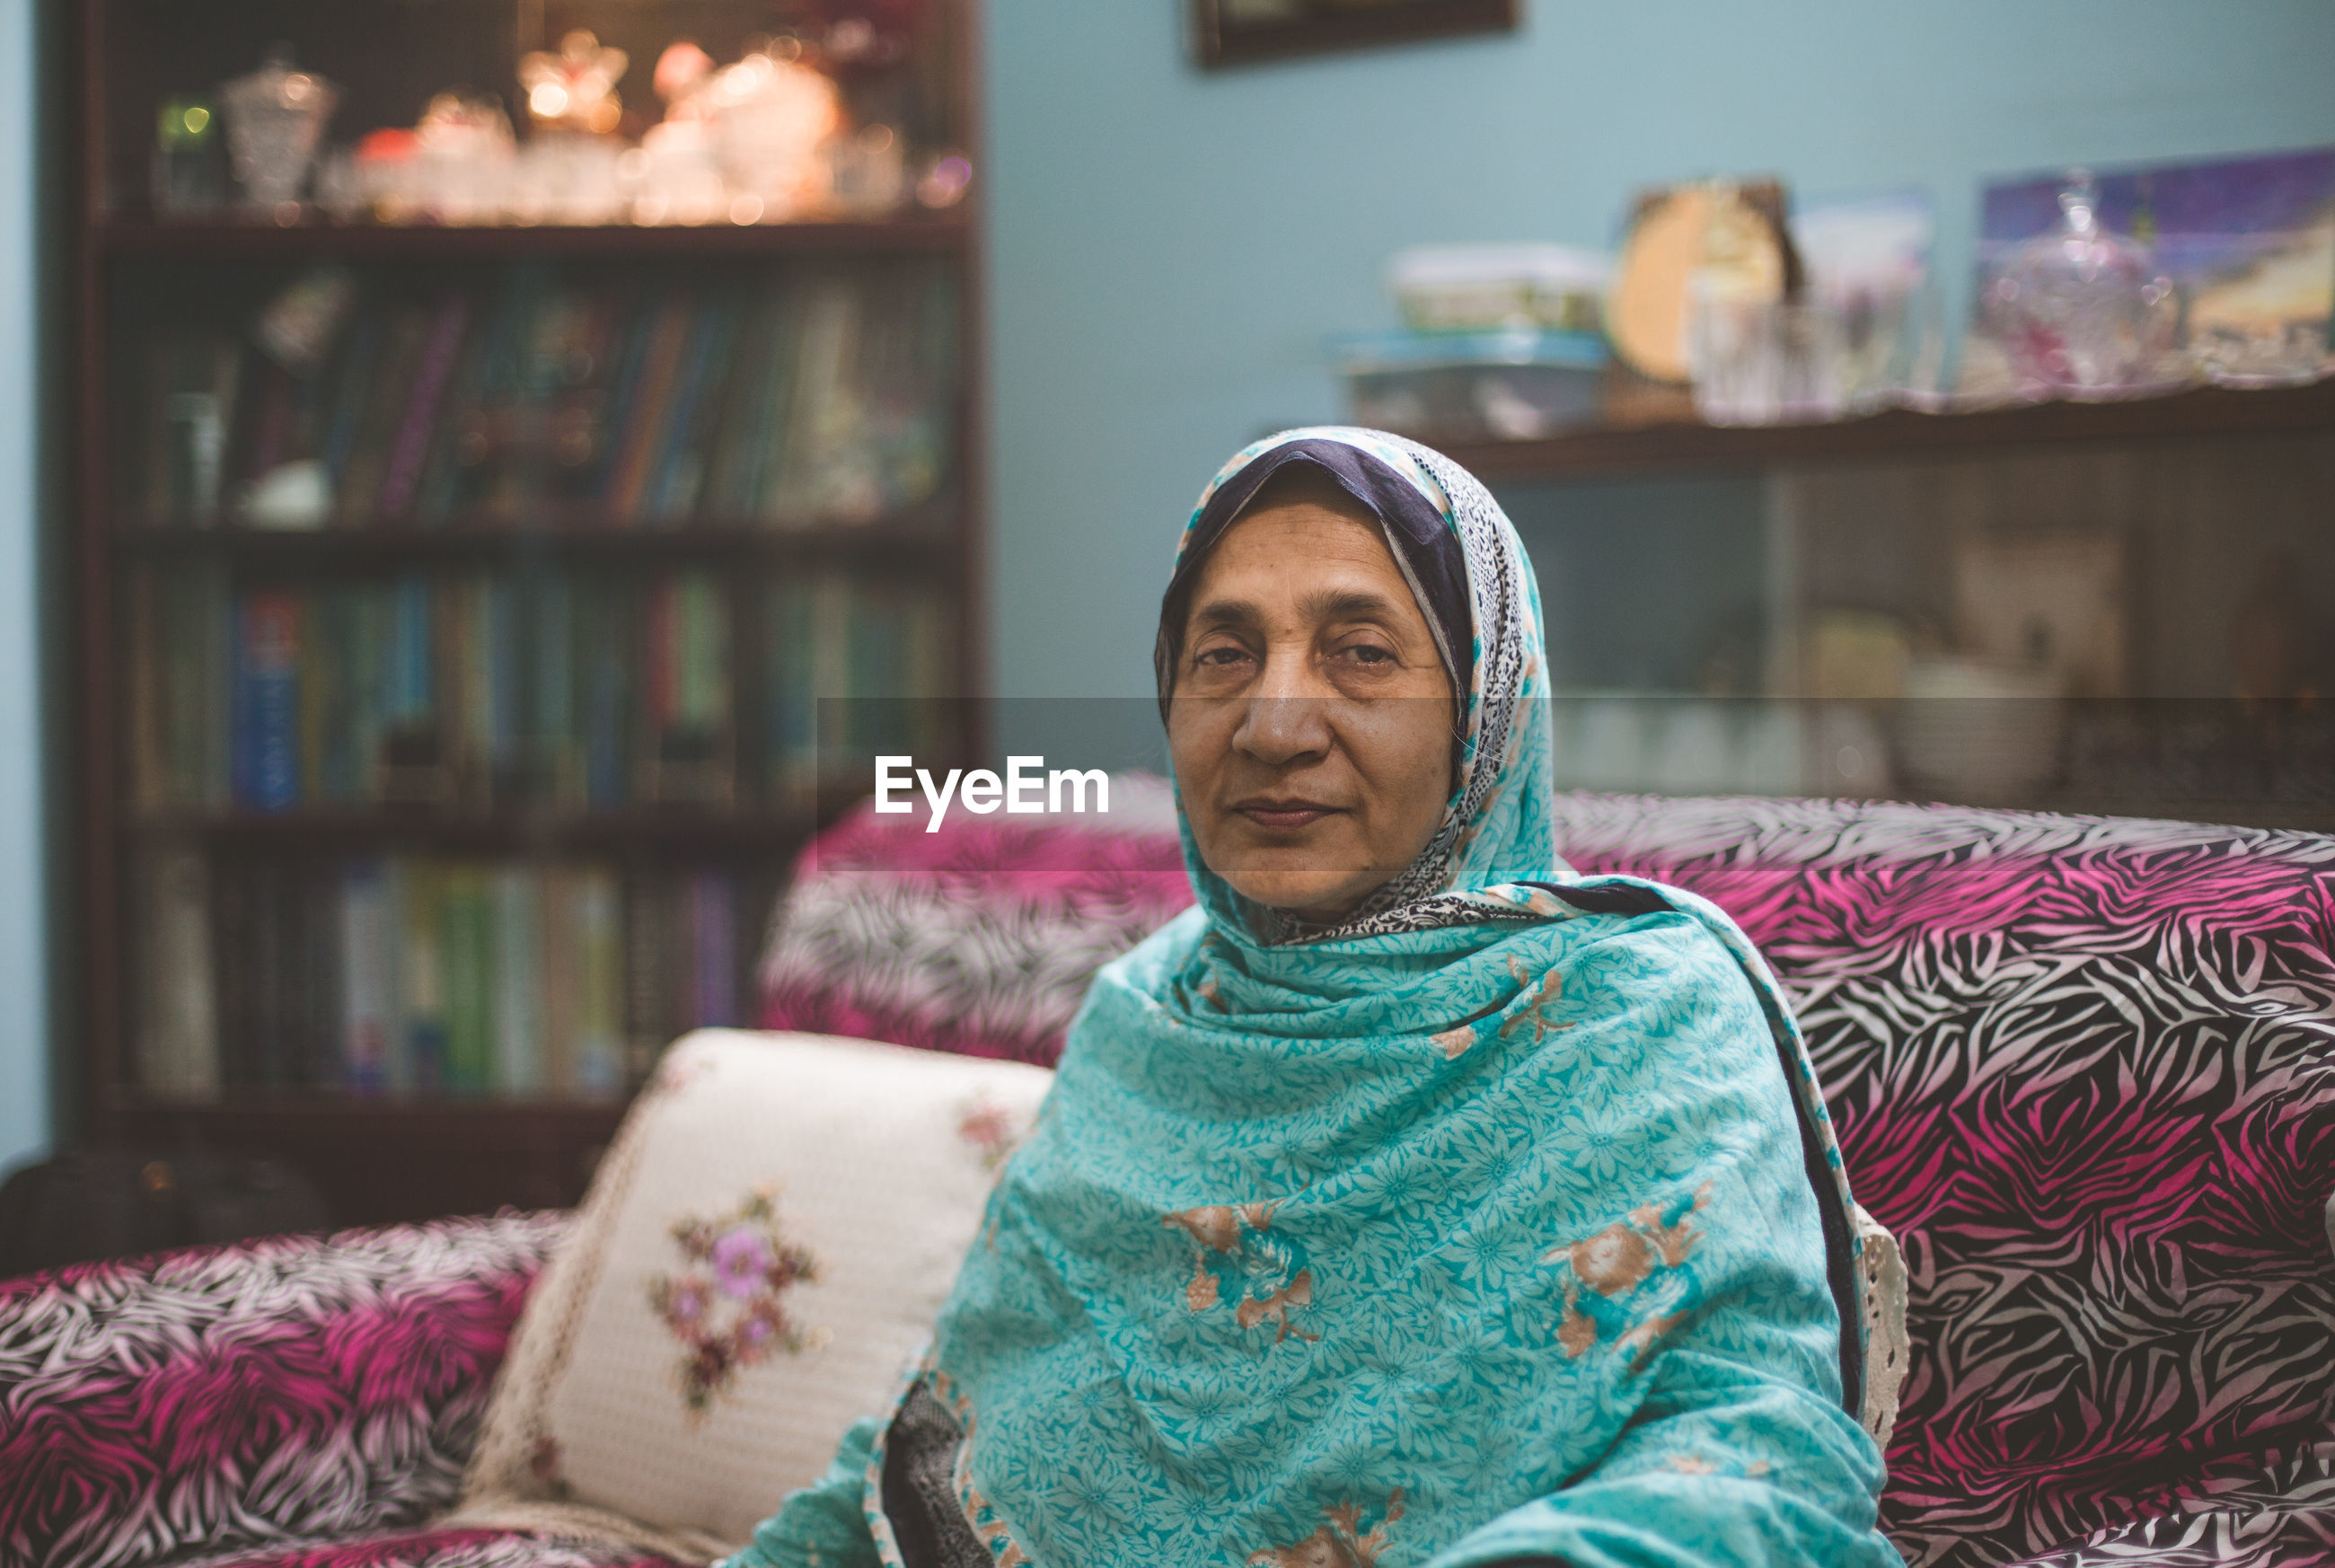 Portrait of senior woman sitting on sofa at home